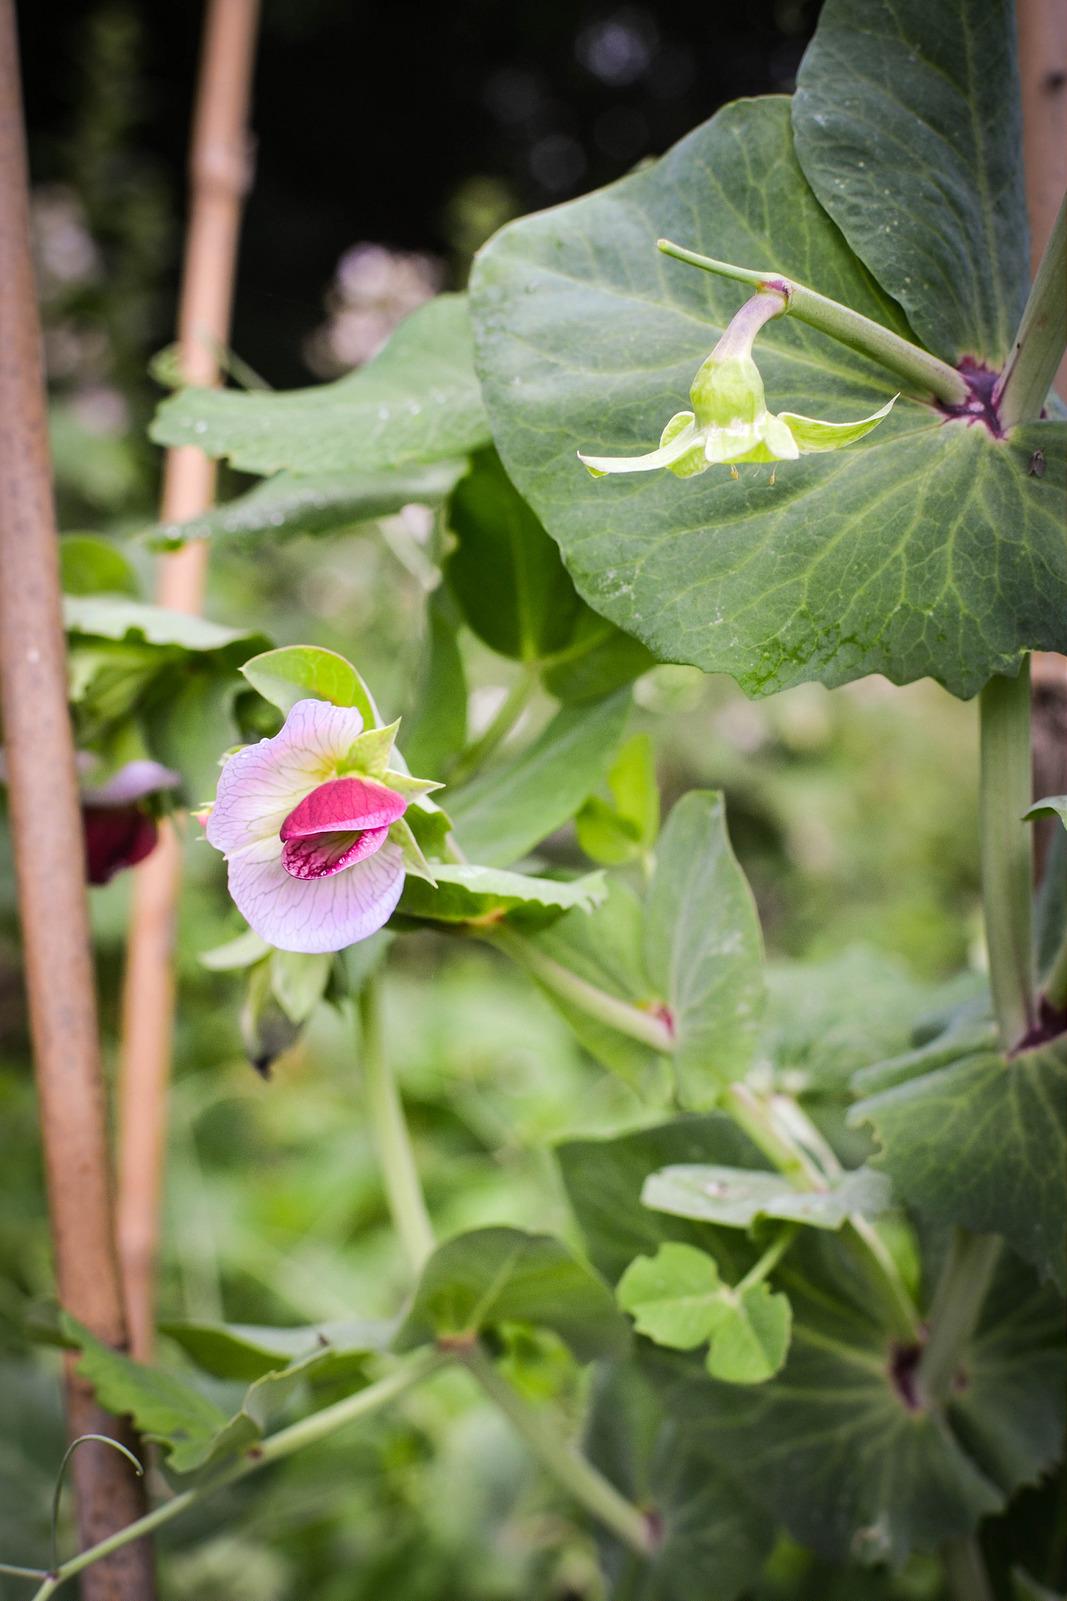 Purple mange tout flower, Shiraz variety Thompson and Morgan